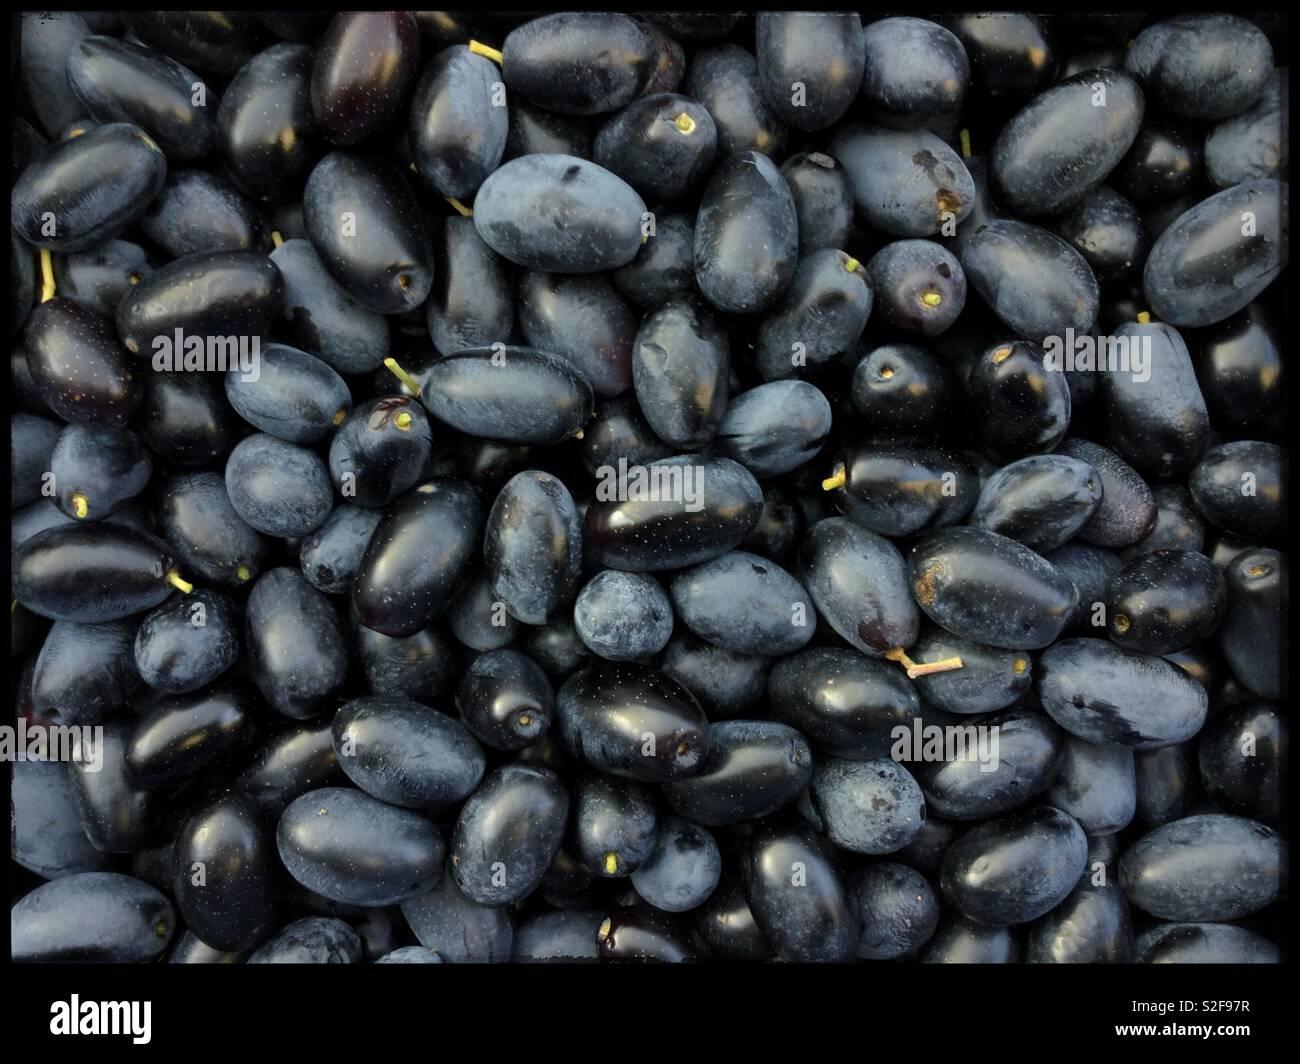 Empeltre olives harvested for extra virgin olive oil, Catalonia, Spain. - Stock Image